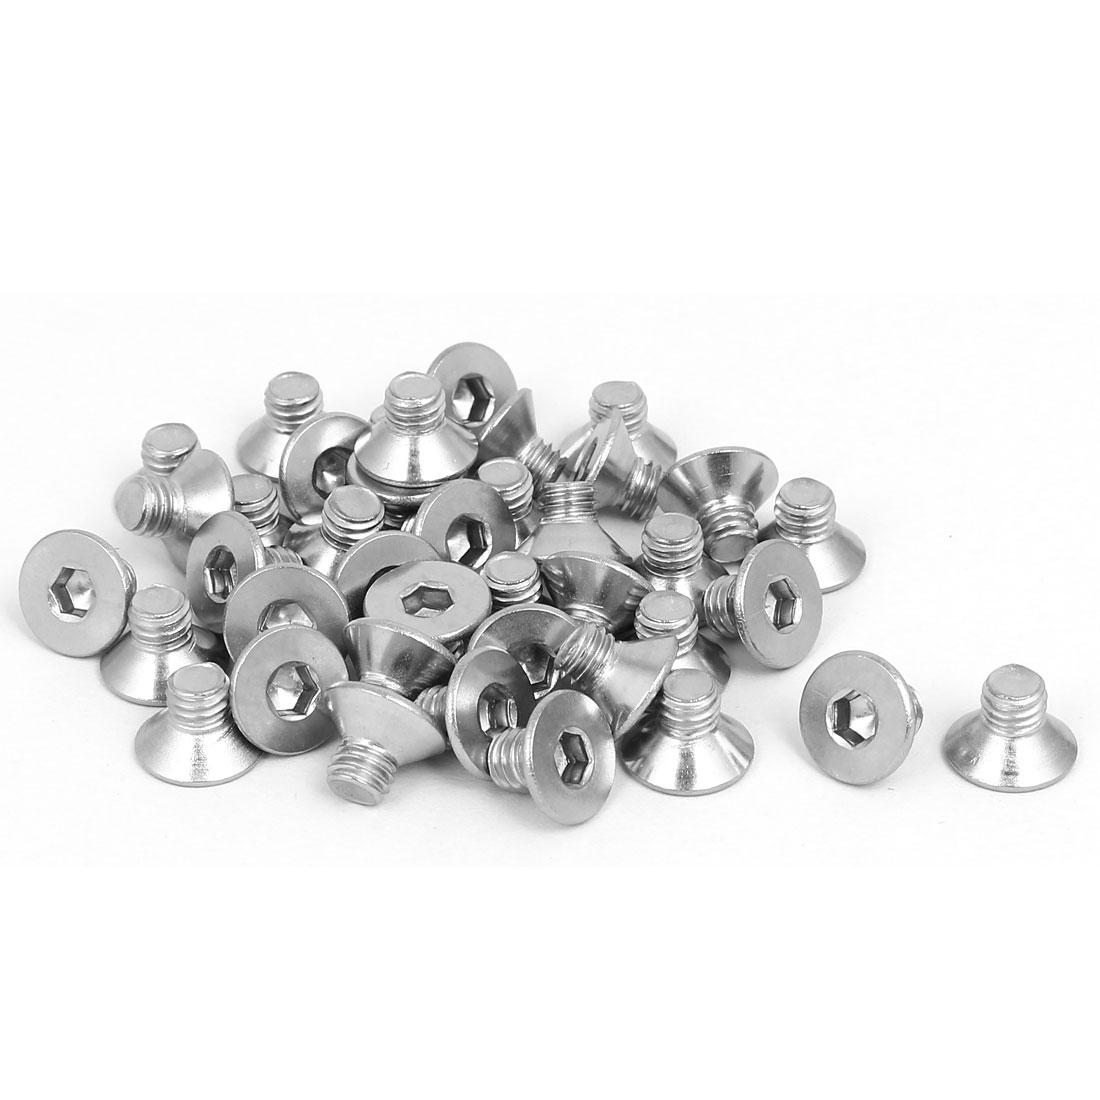 M6x8mm 304 Stainless Steel Flat Head Hex Socket Screws Fastener DIN7991 40pcs